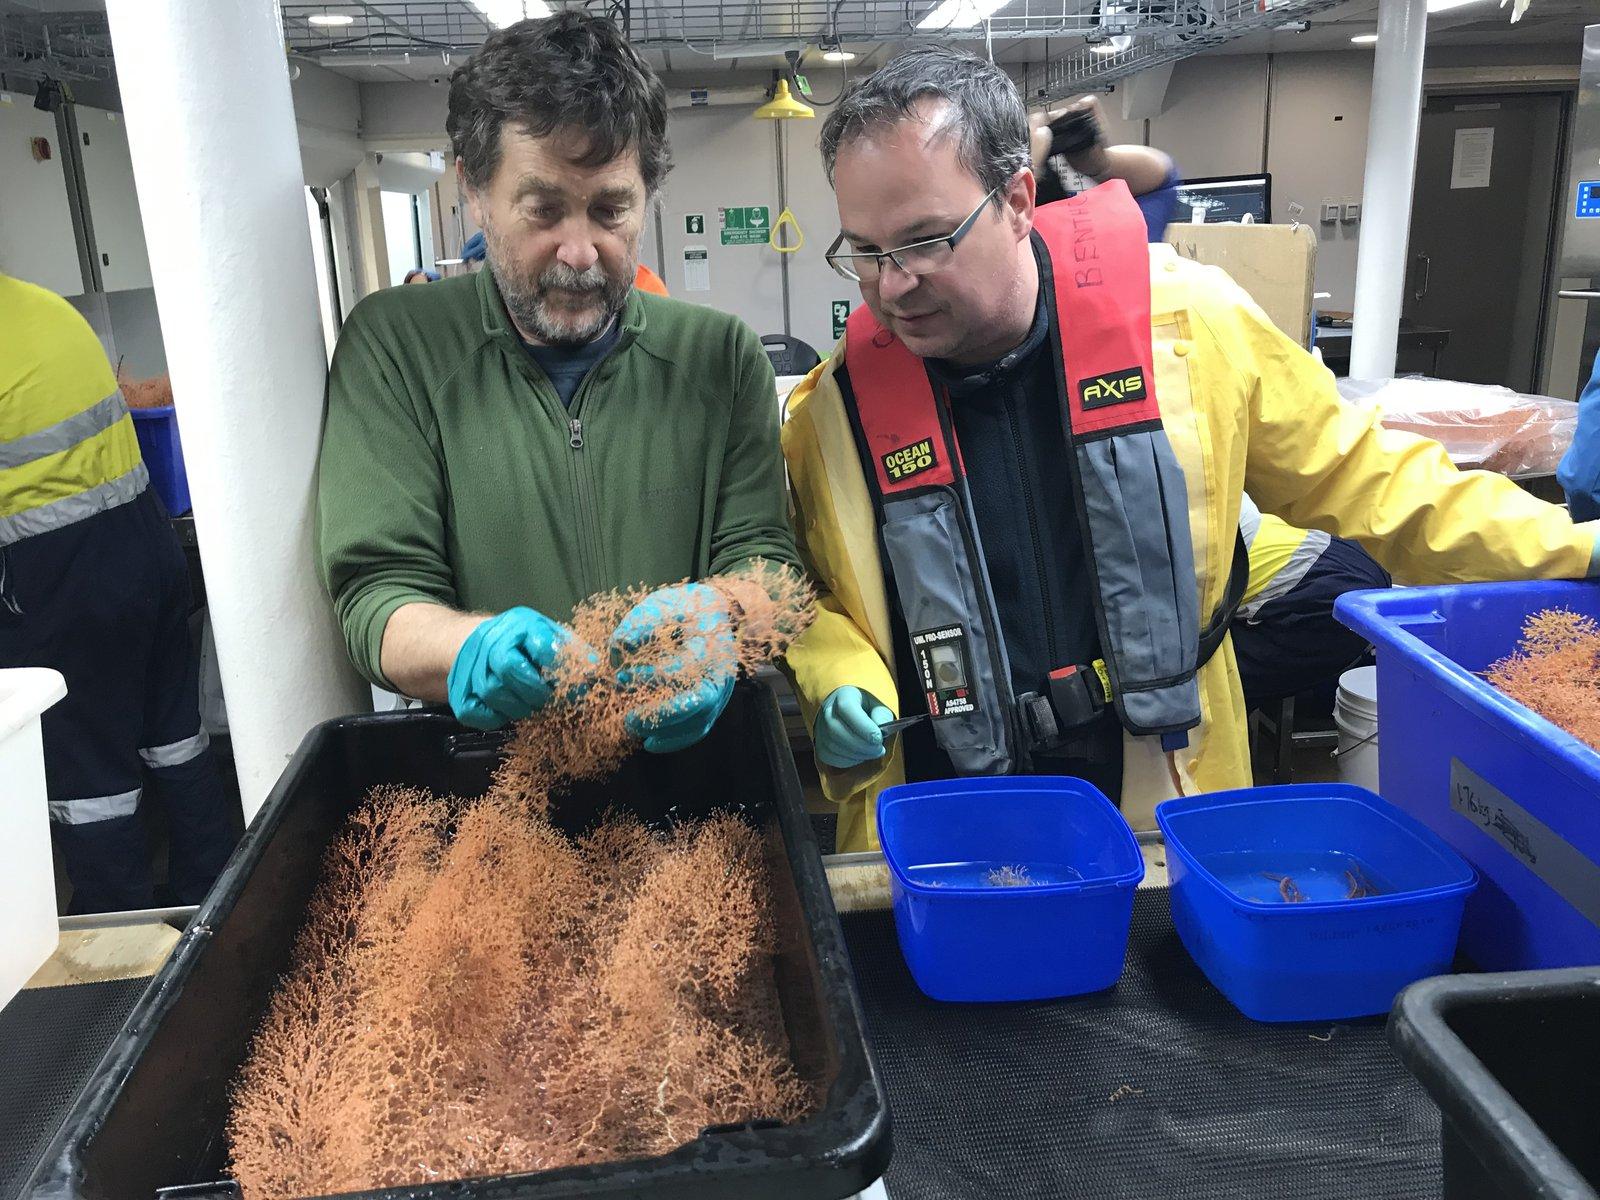 RV Investigator Expedition - November 2018